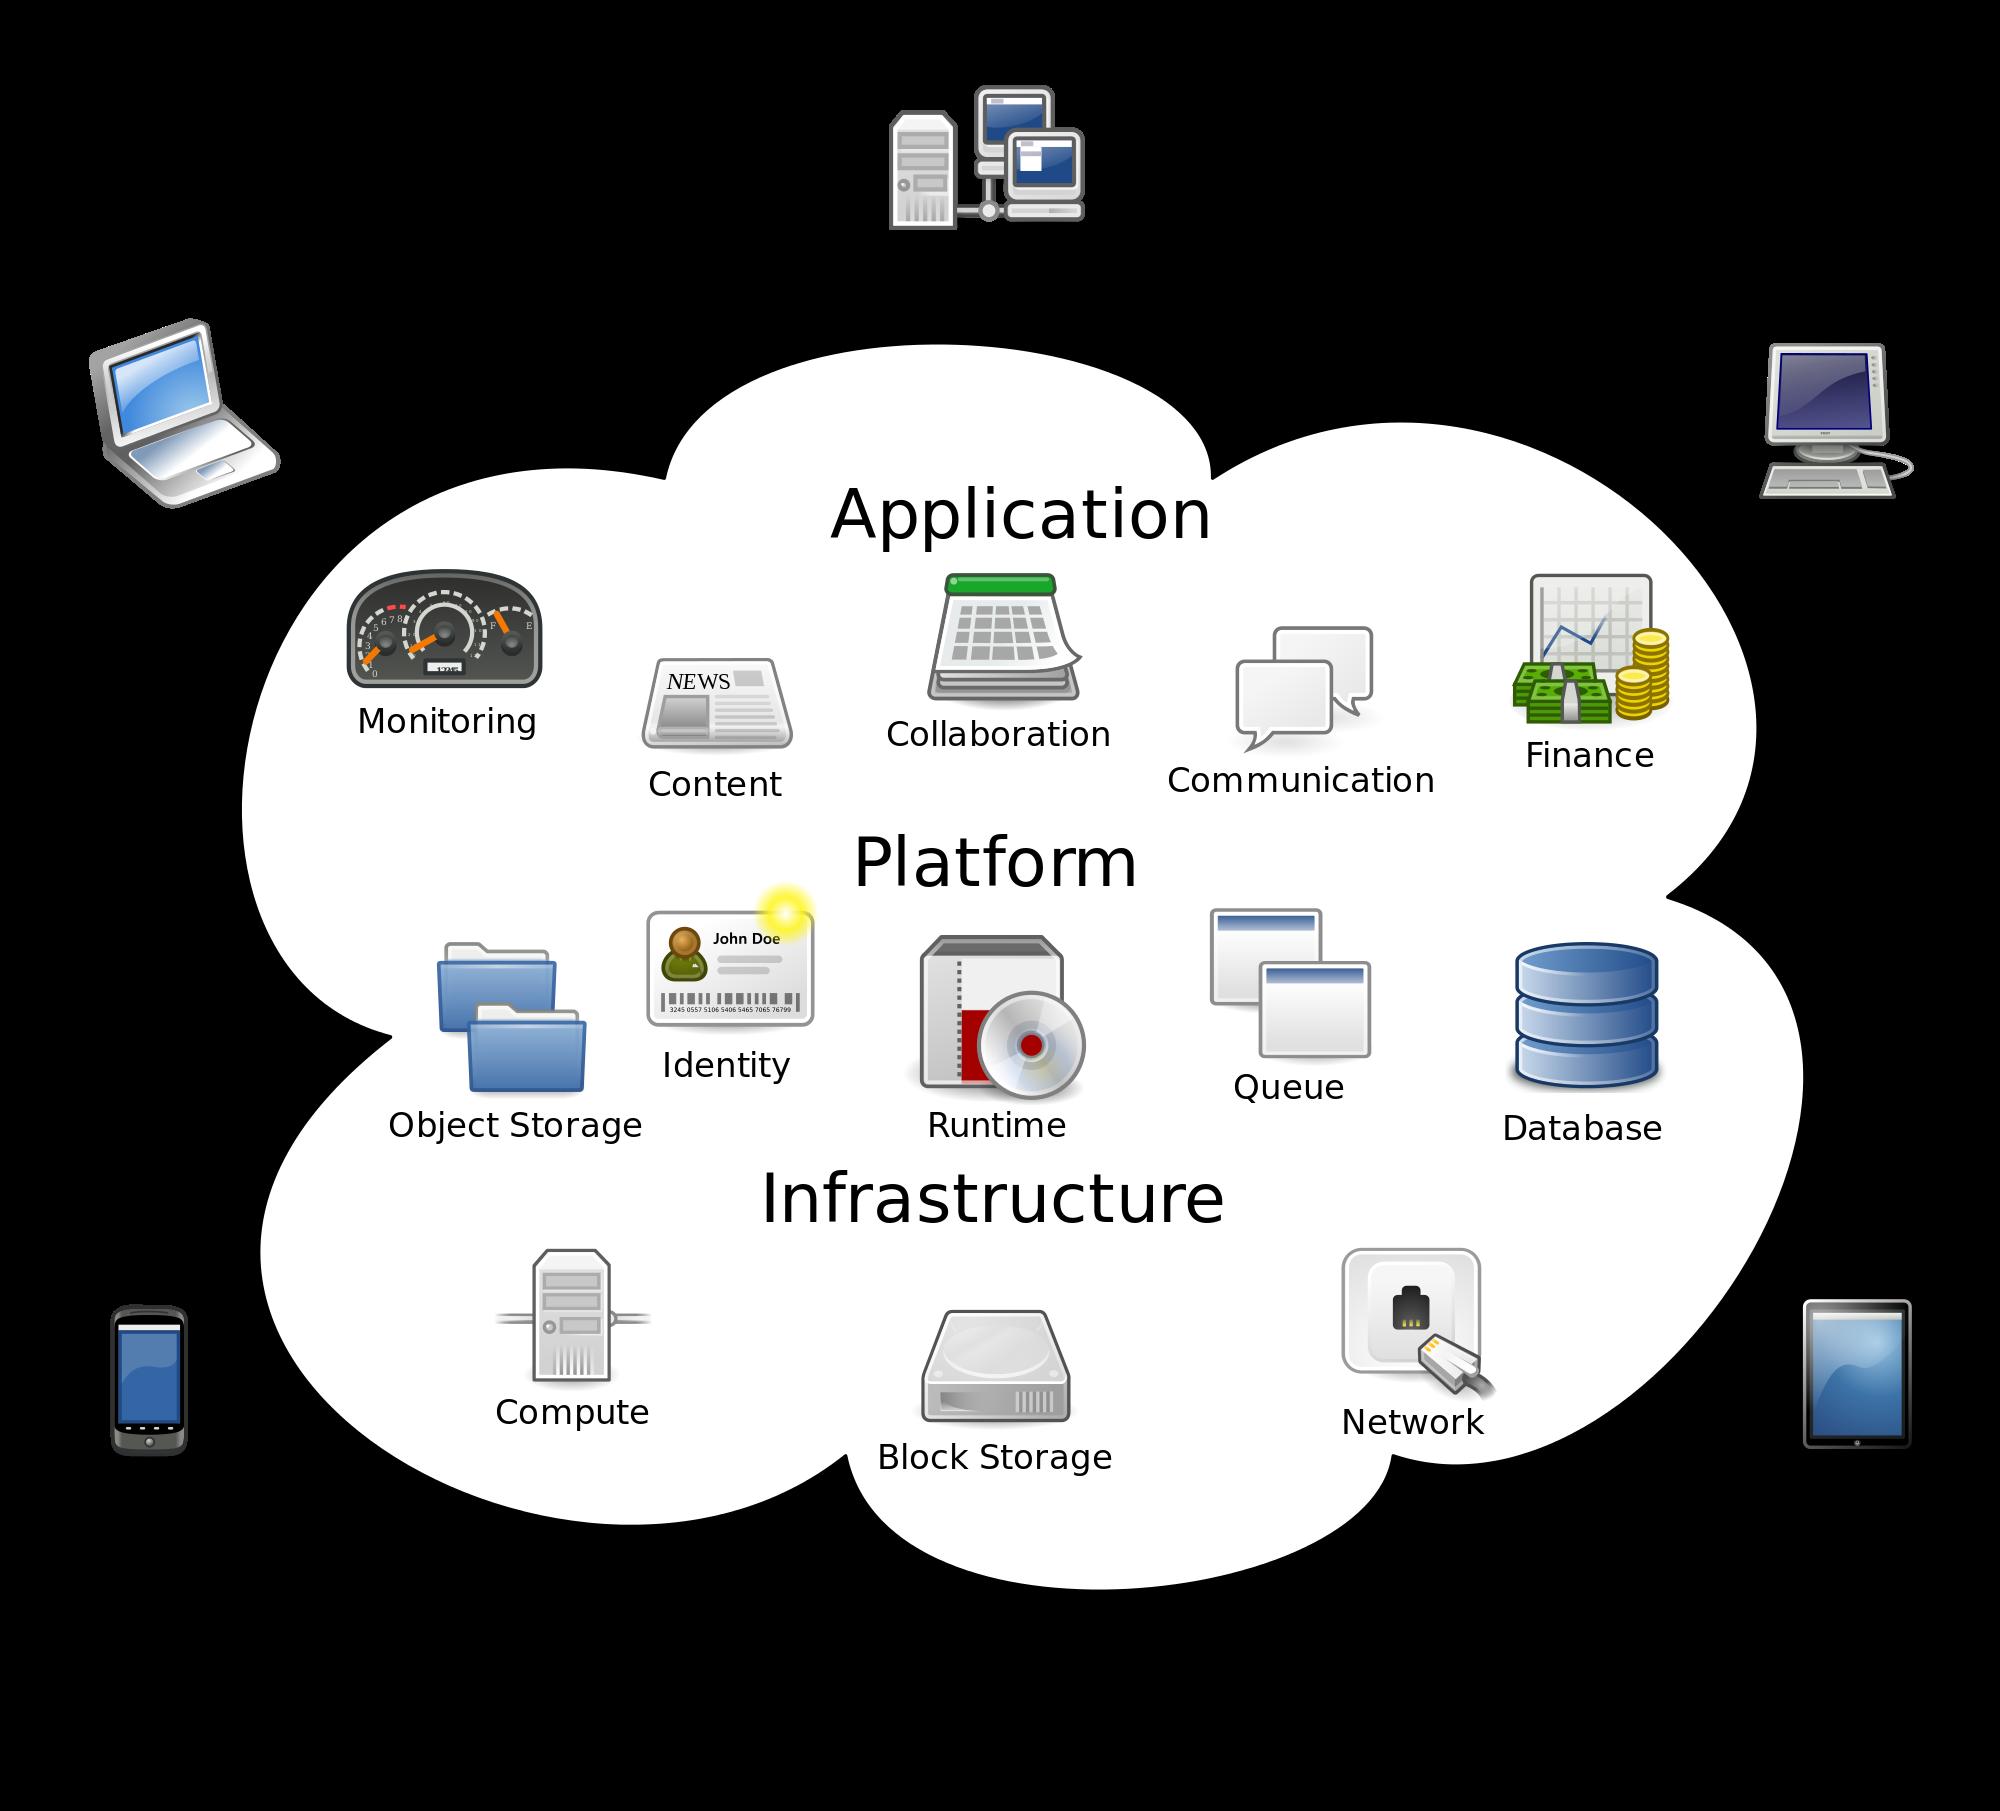 Cloud_computing infrastructure